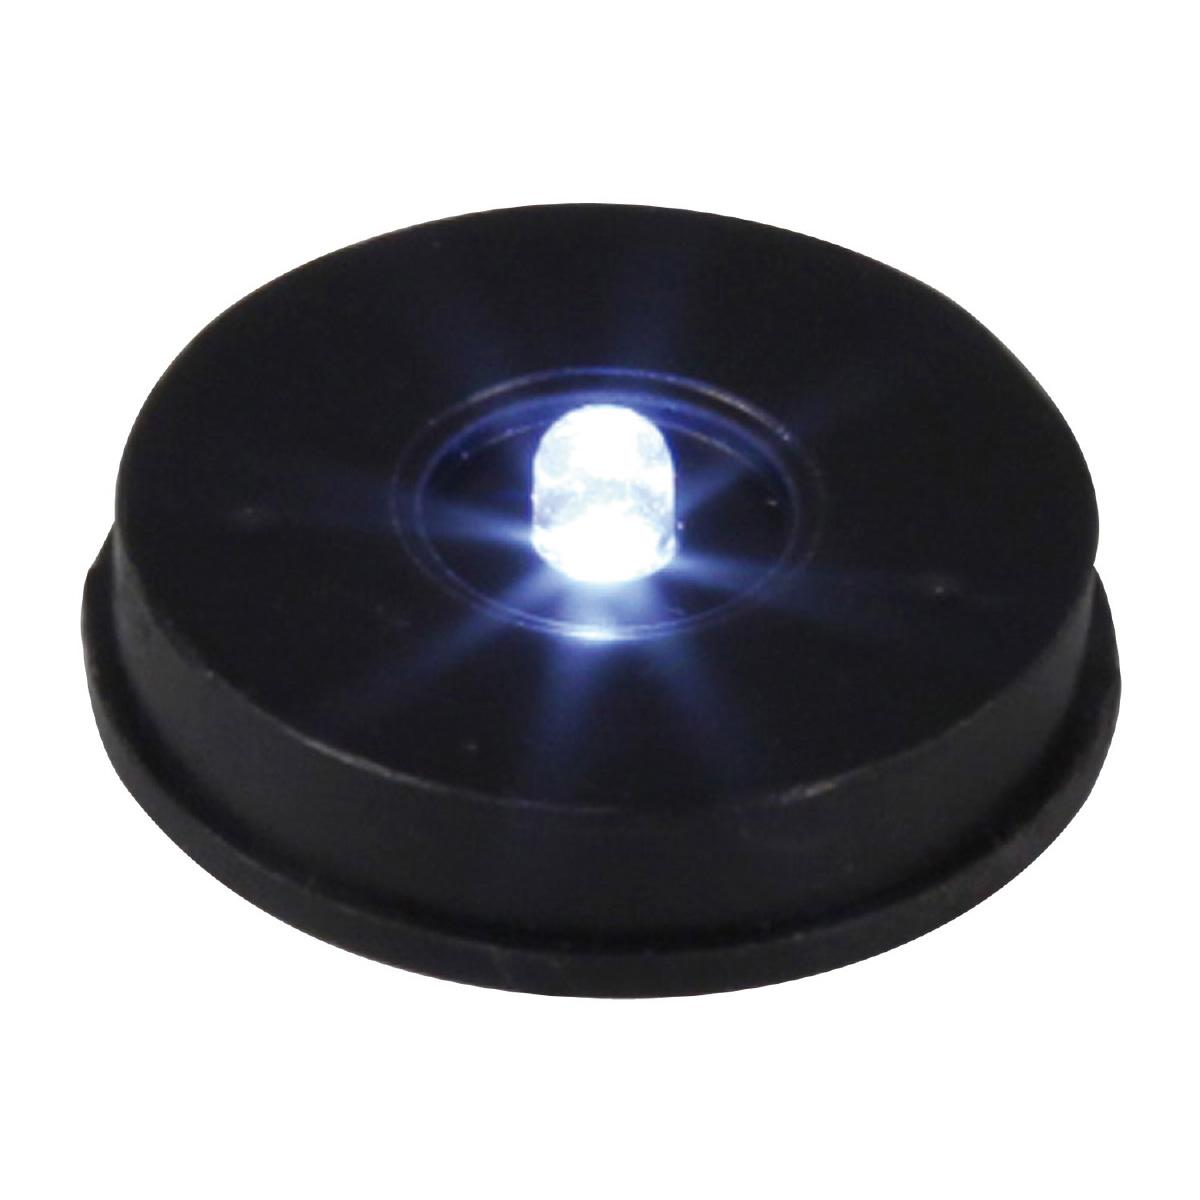 LEDコインライト ボタン電池 工作 ライト 照明 飾り コードレス クリスマス テーブルランプ 置き型 卓上 デスク 図工 キッズ 小学生 画材 学校教材 美術 自由研究